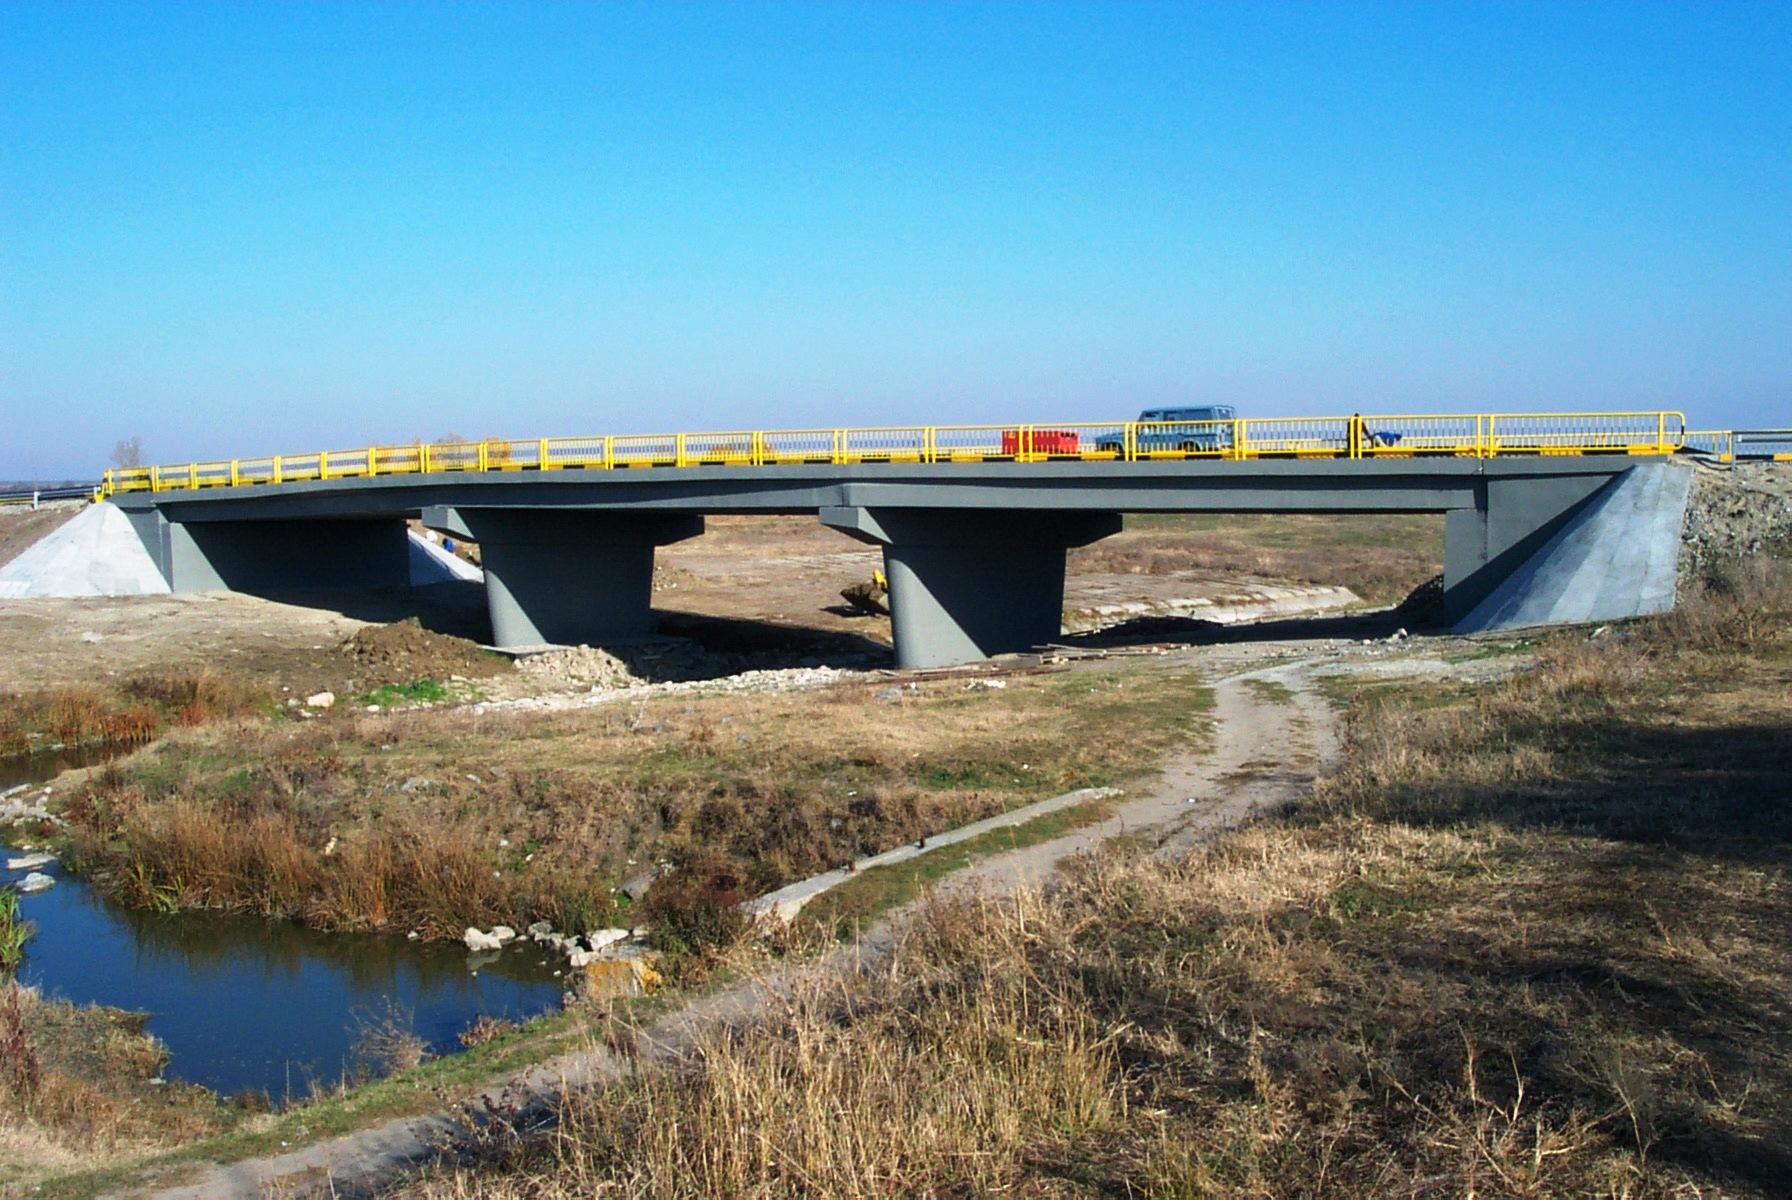 Reparatii pod (DN2), Km. 33 - 028, peste raul Calnistea MAPEI - Poza 15